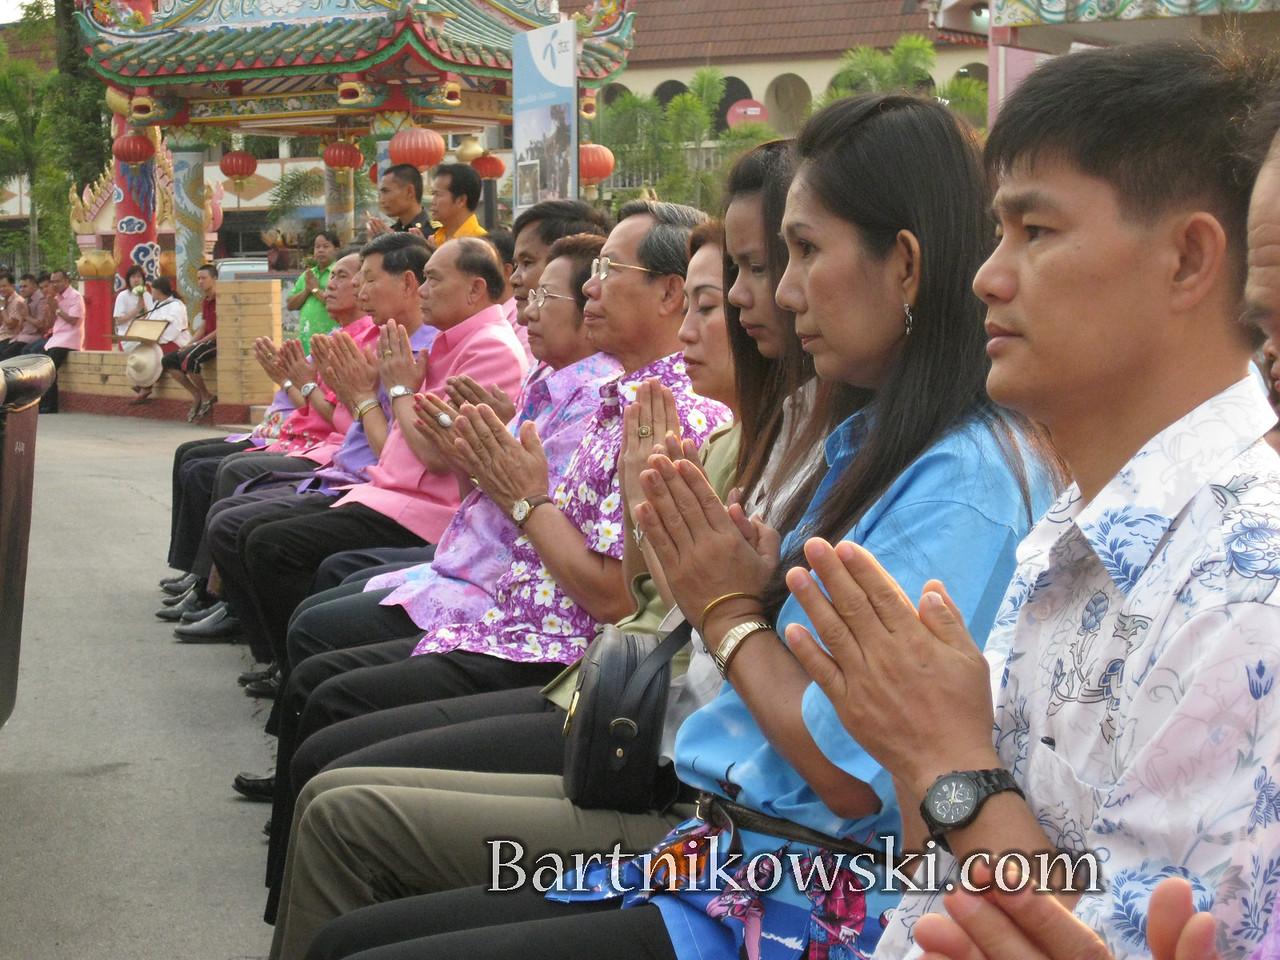 Songkran: New Year's Day Thailand